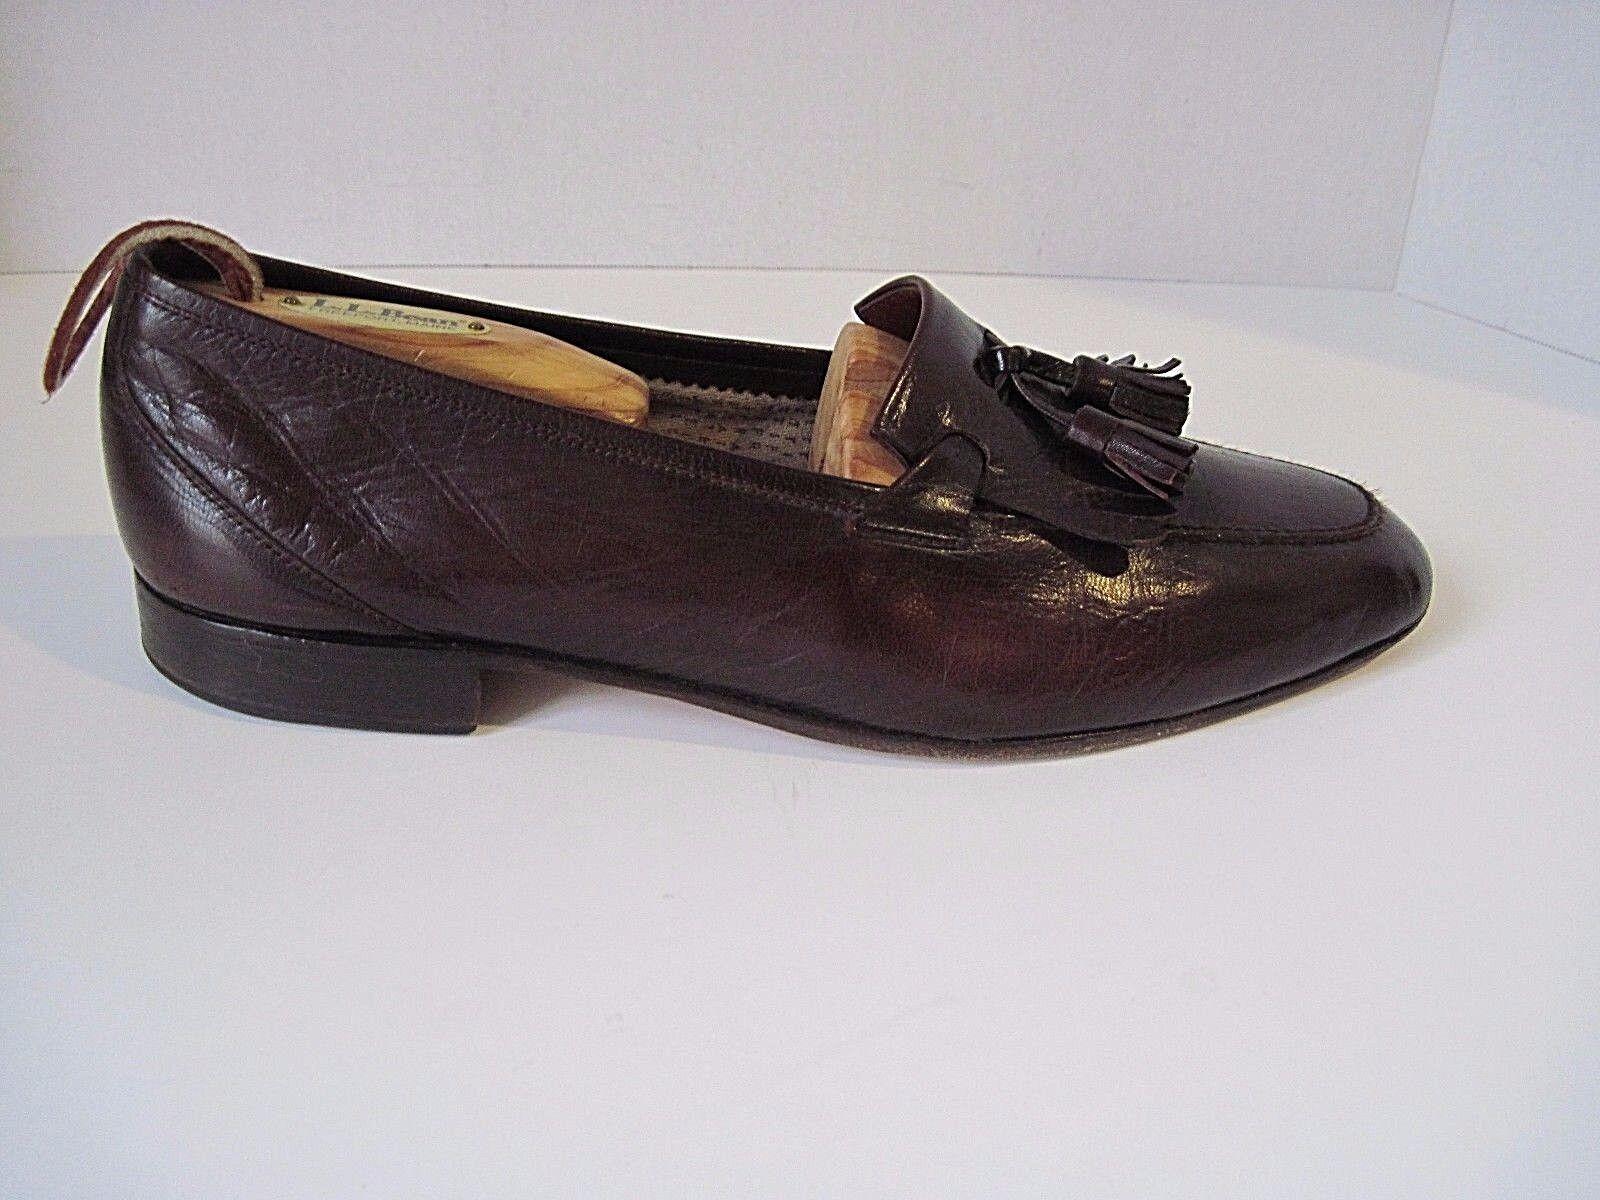 Vintage FRATELLI ROSSETTI ESTATE Bilbao Cordovan Leather Loafers Tassels Size 43